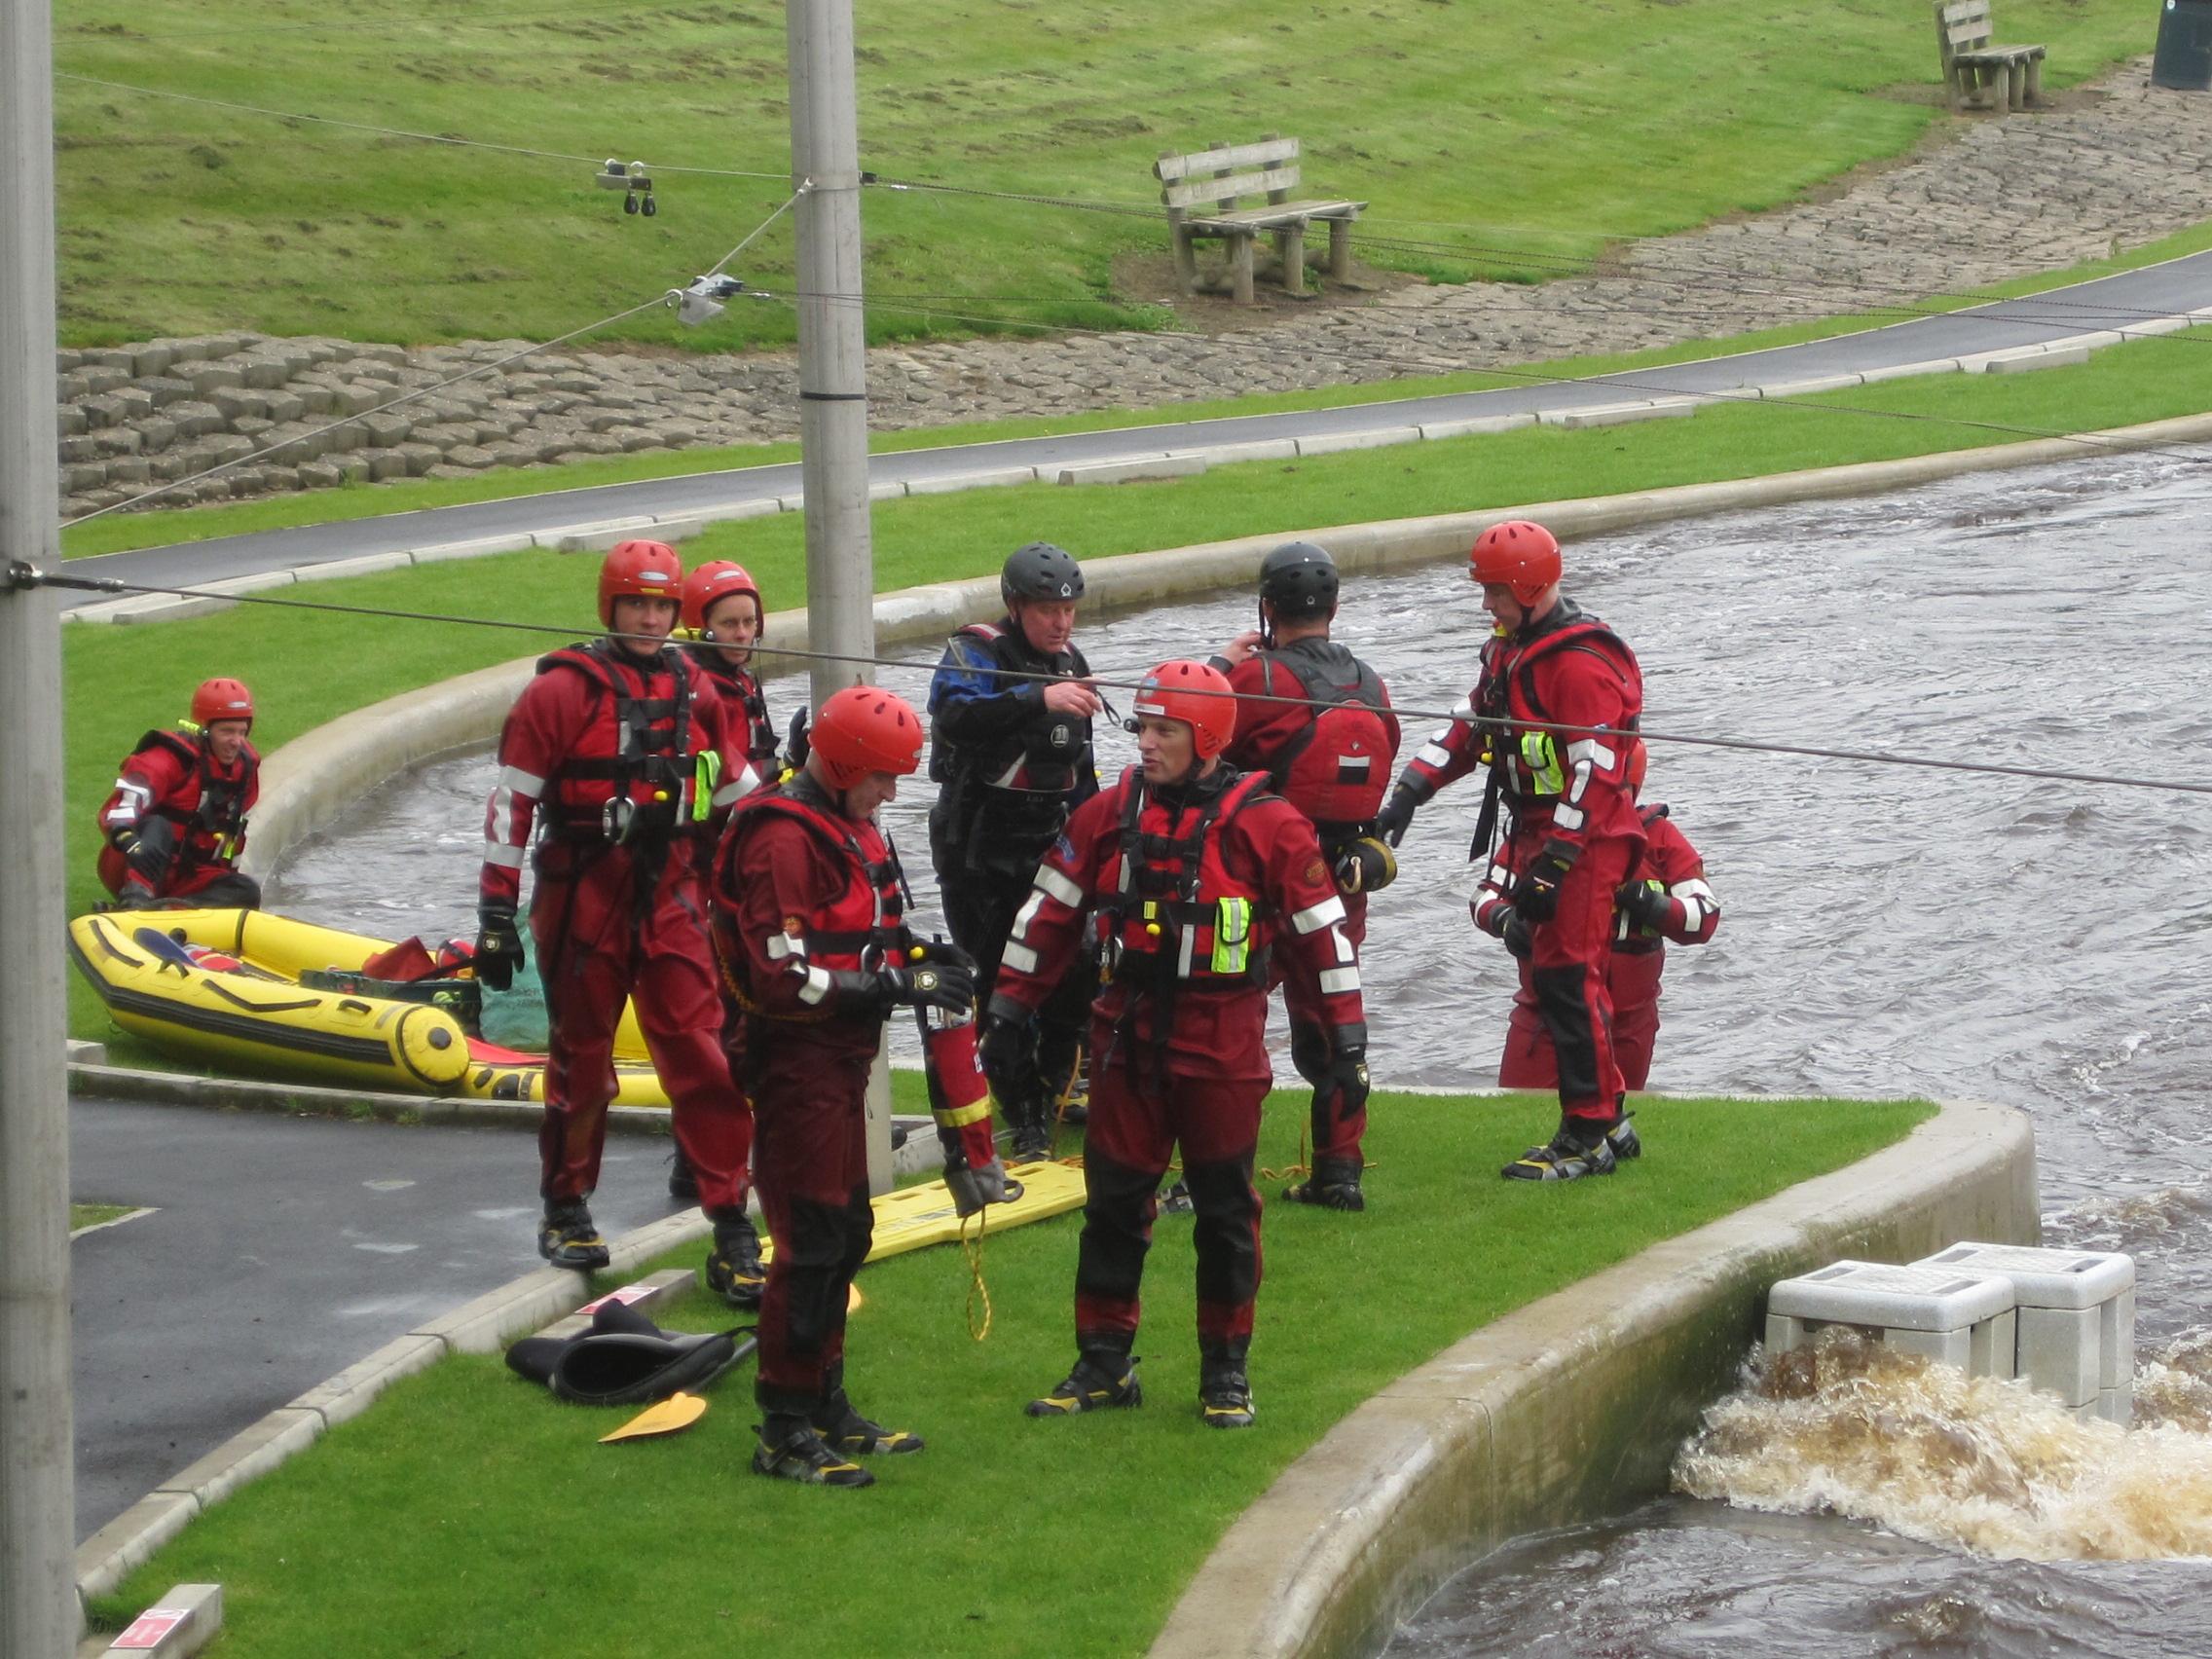 But sometimes the Fire Brigade provide a little sport